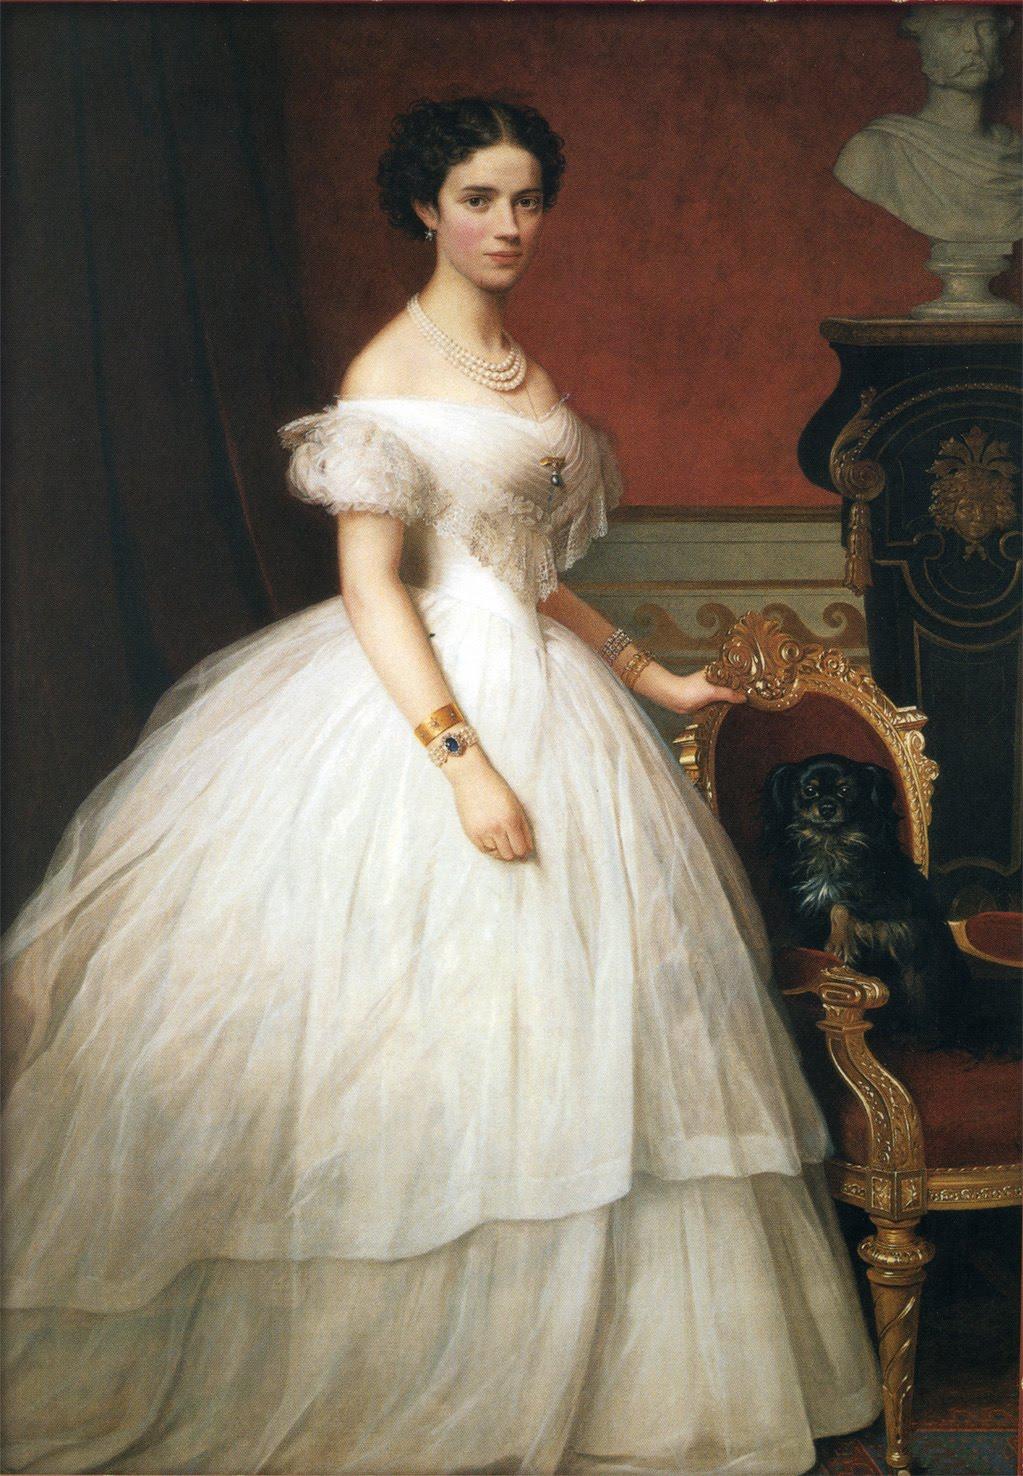 Victorian woman in white dress.jpg